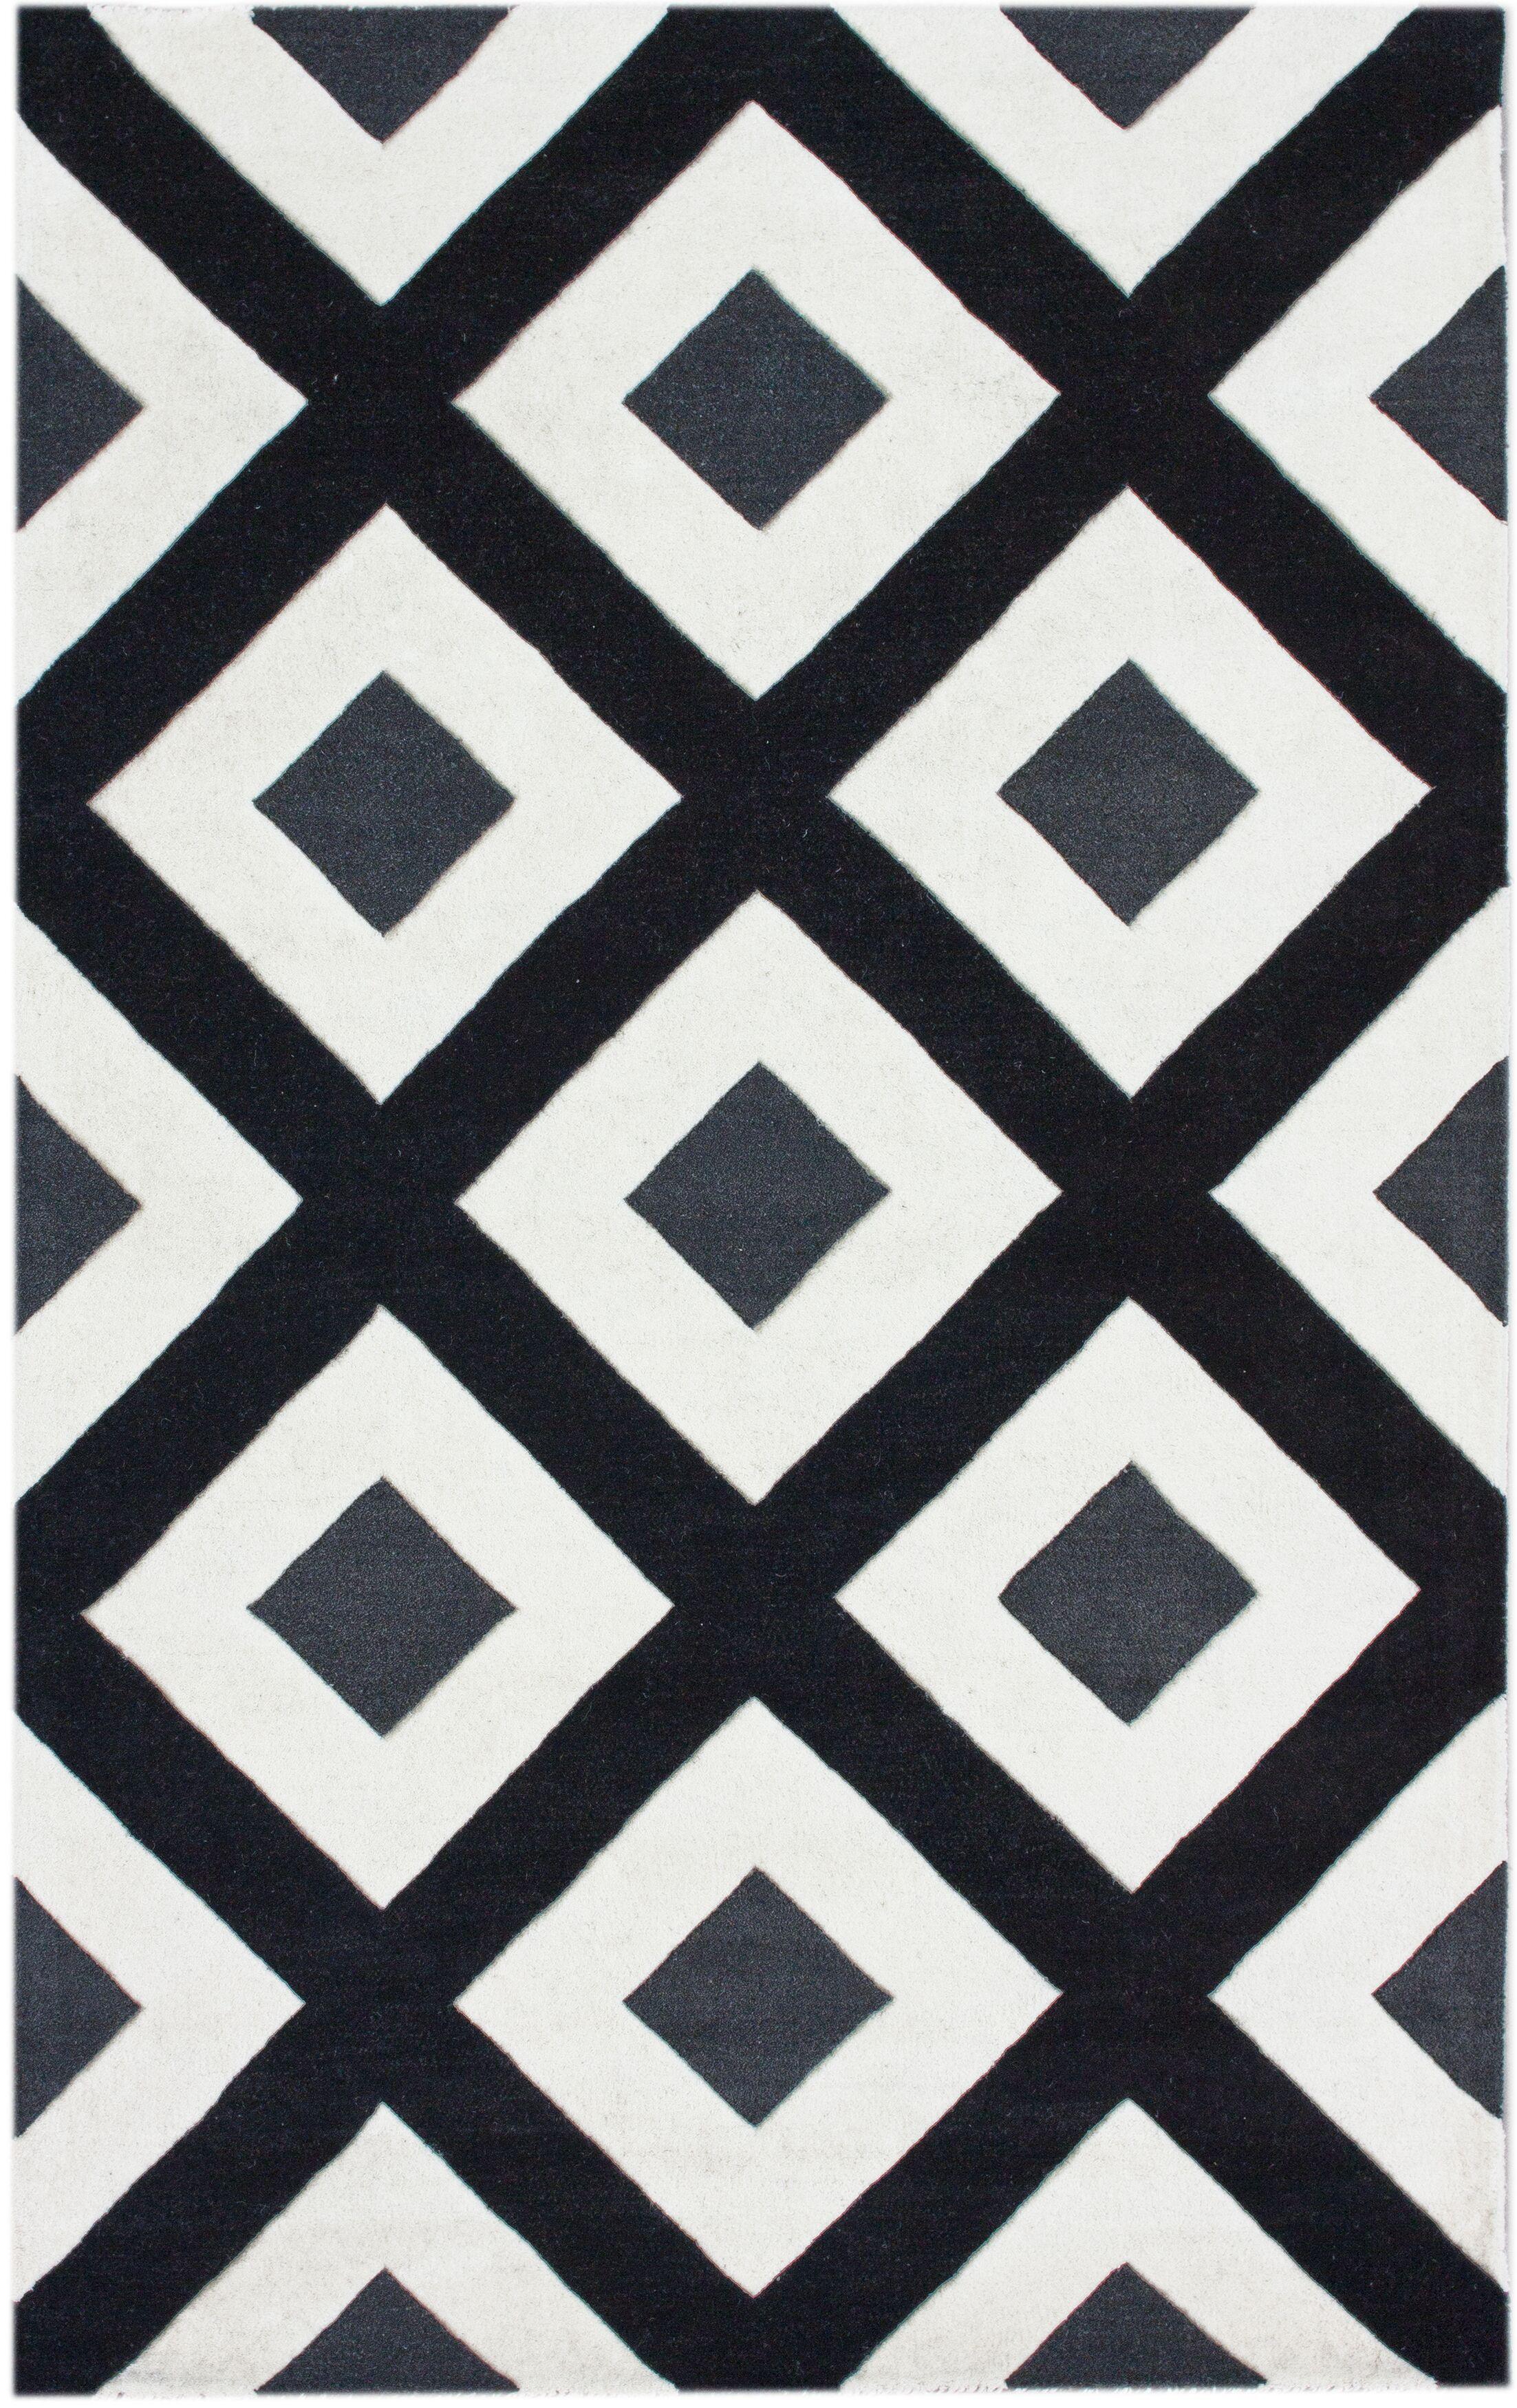 Bella Diamonds Hand-Tufted Wool Black/White Area Rug Rug Size: Rectangle 5' x 8'